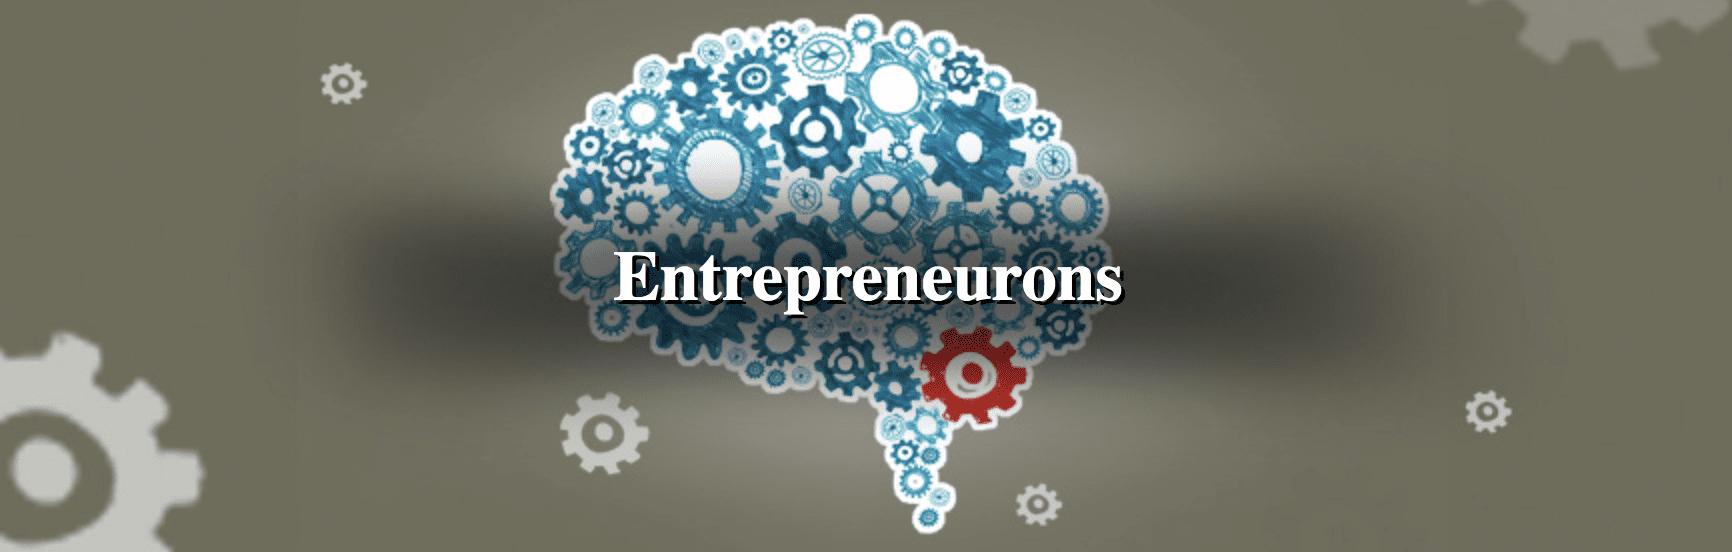 Entrepreneurons